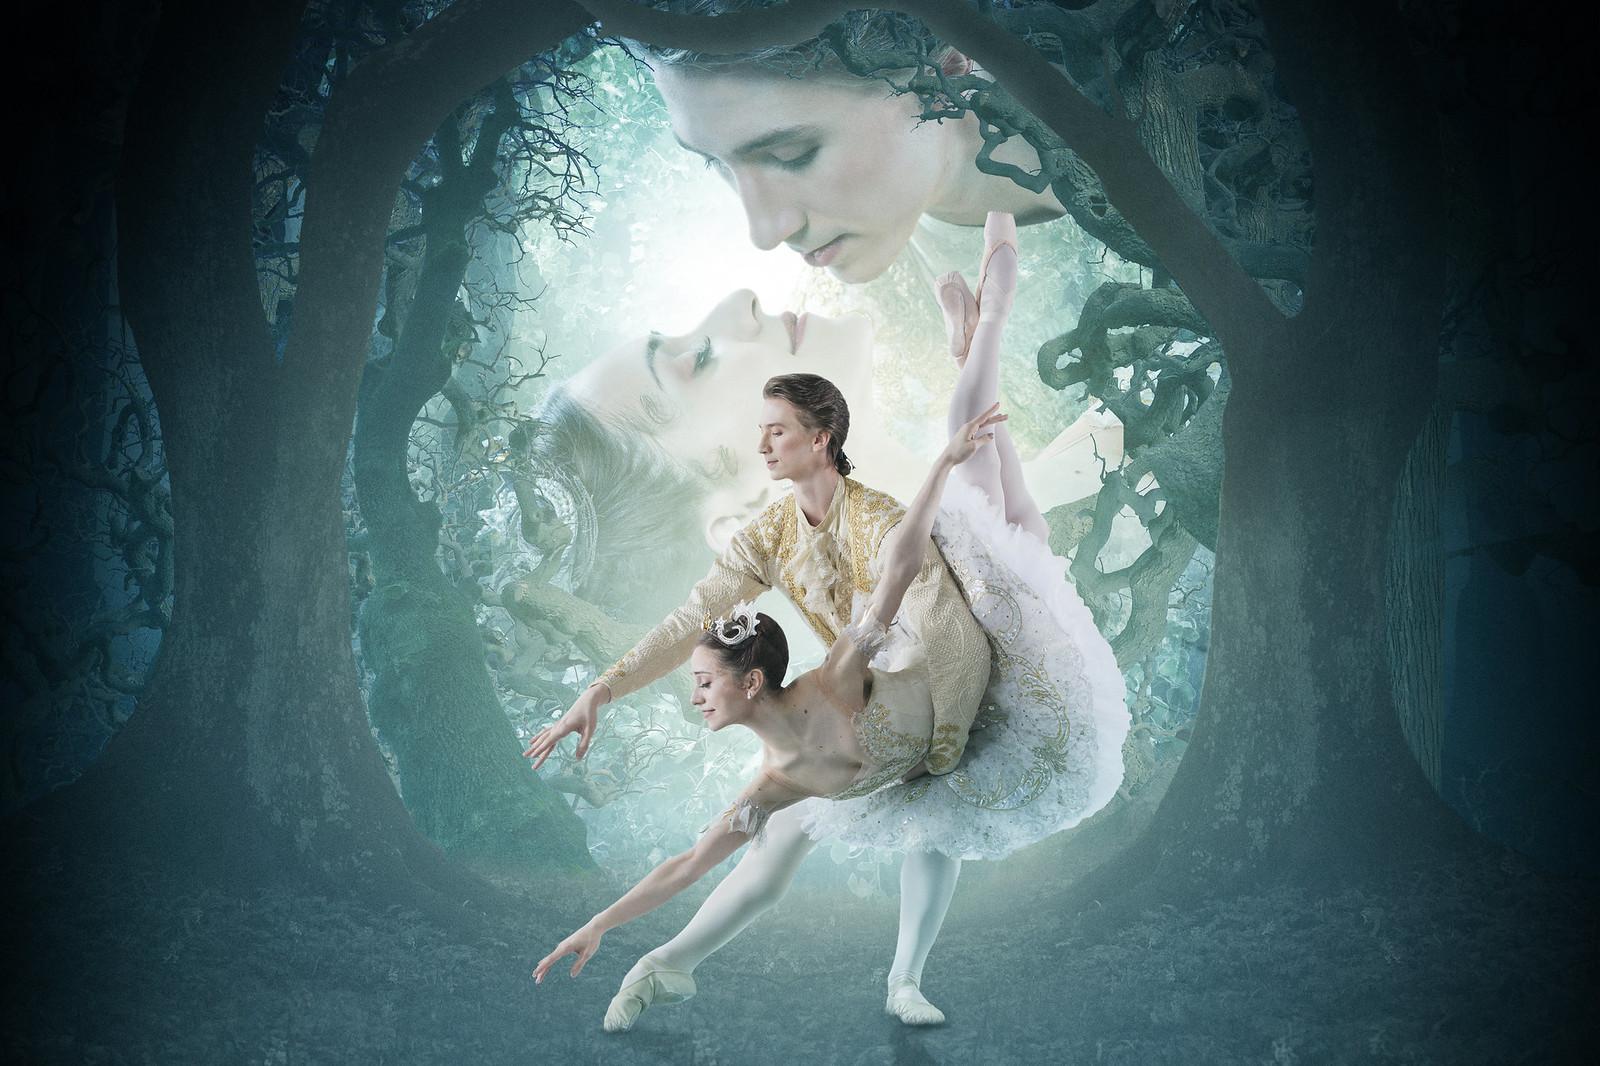 Marianela nuñez as princess aurora and vadim muntagirov as prince florimund in the royal ballet's the sleeping beauty